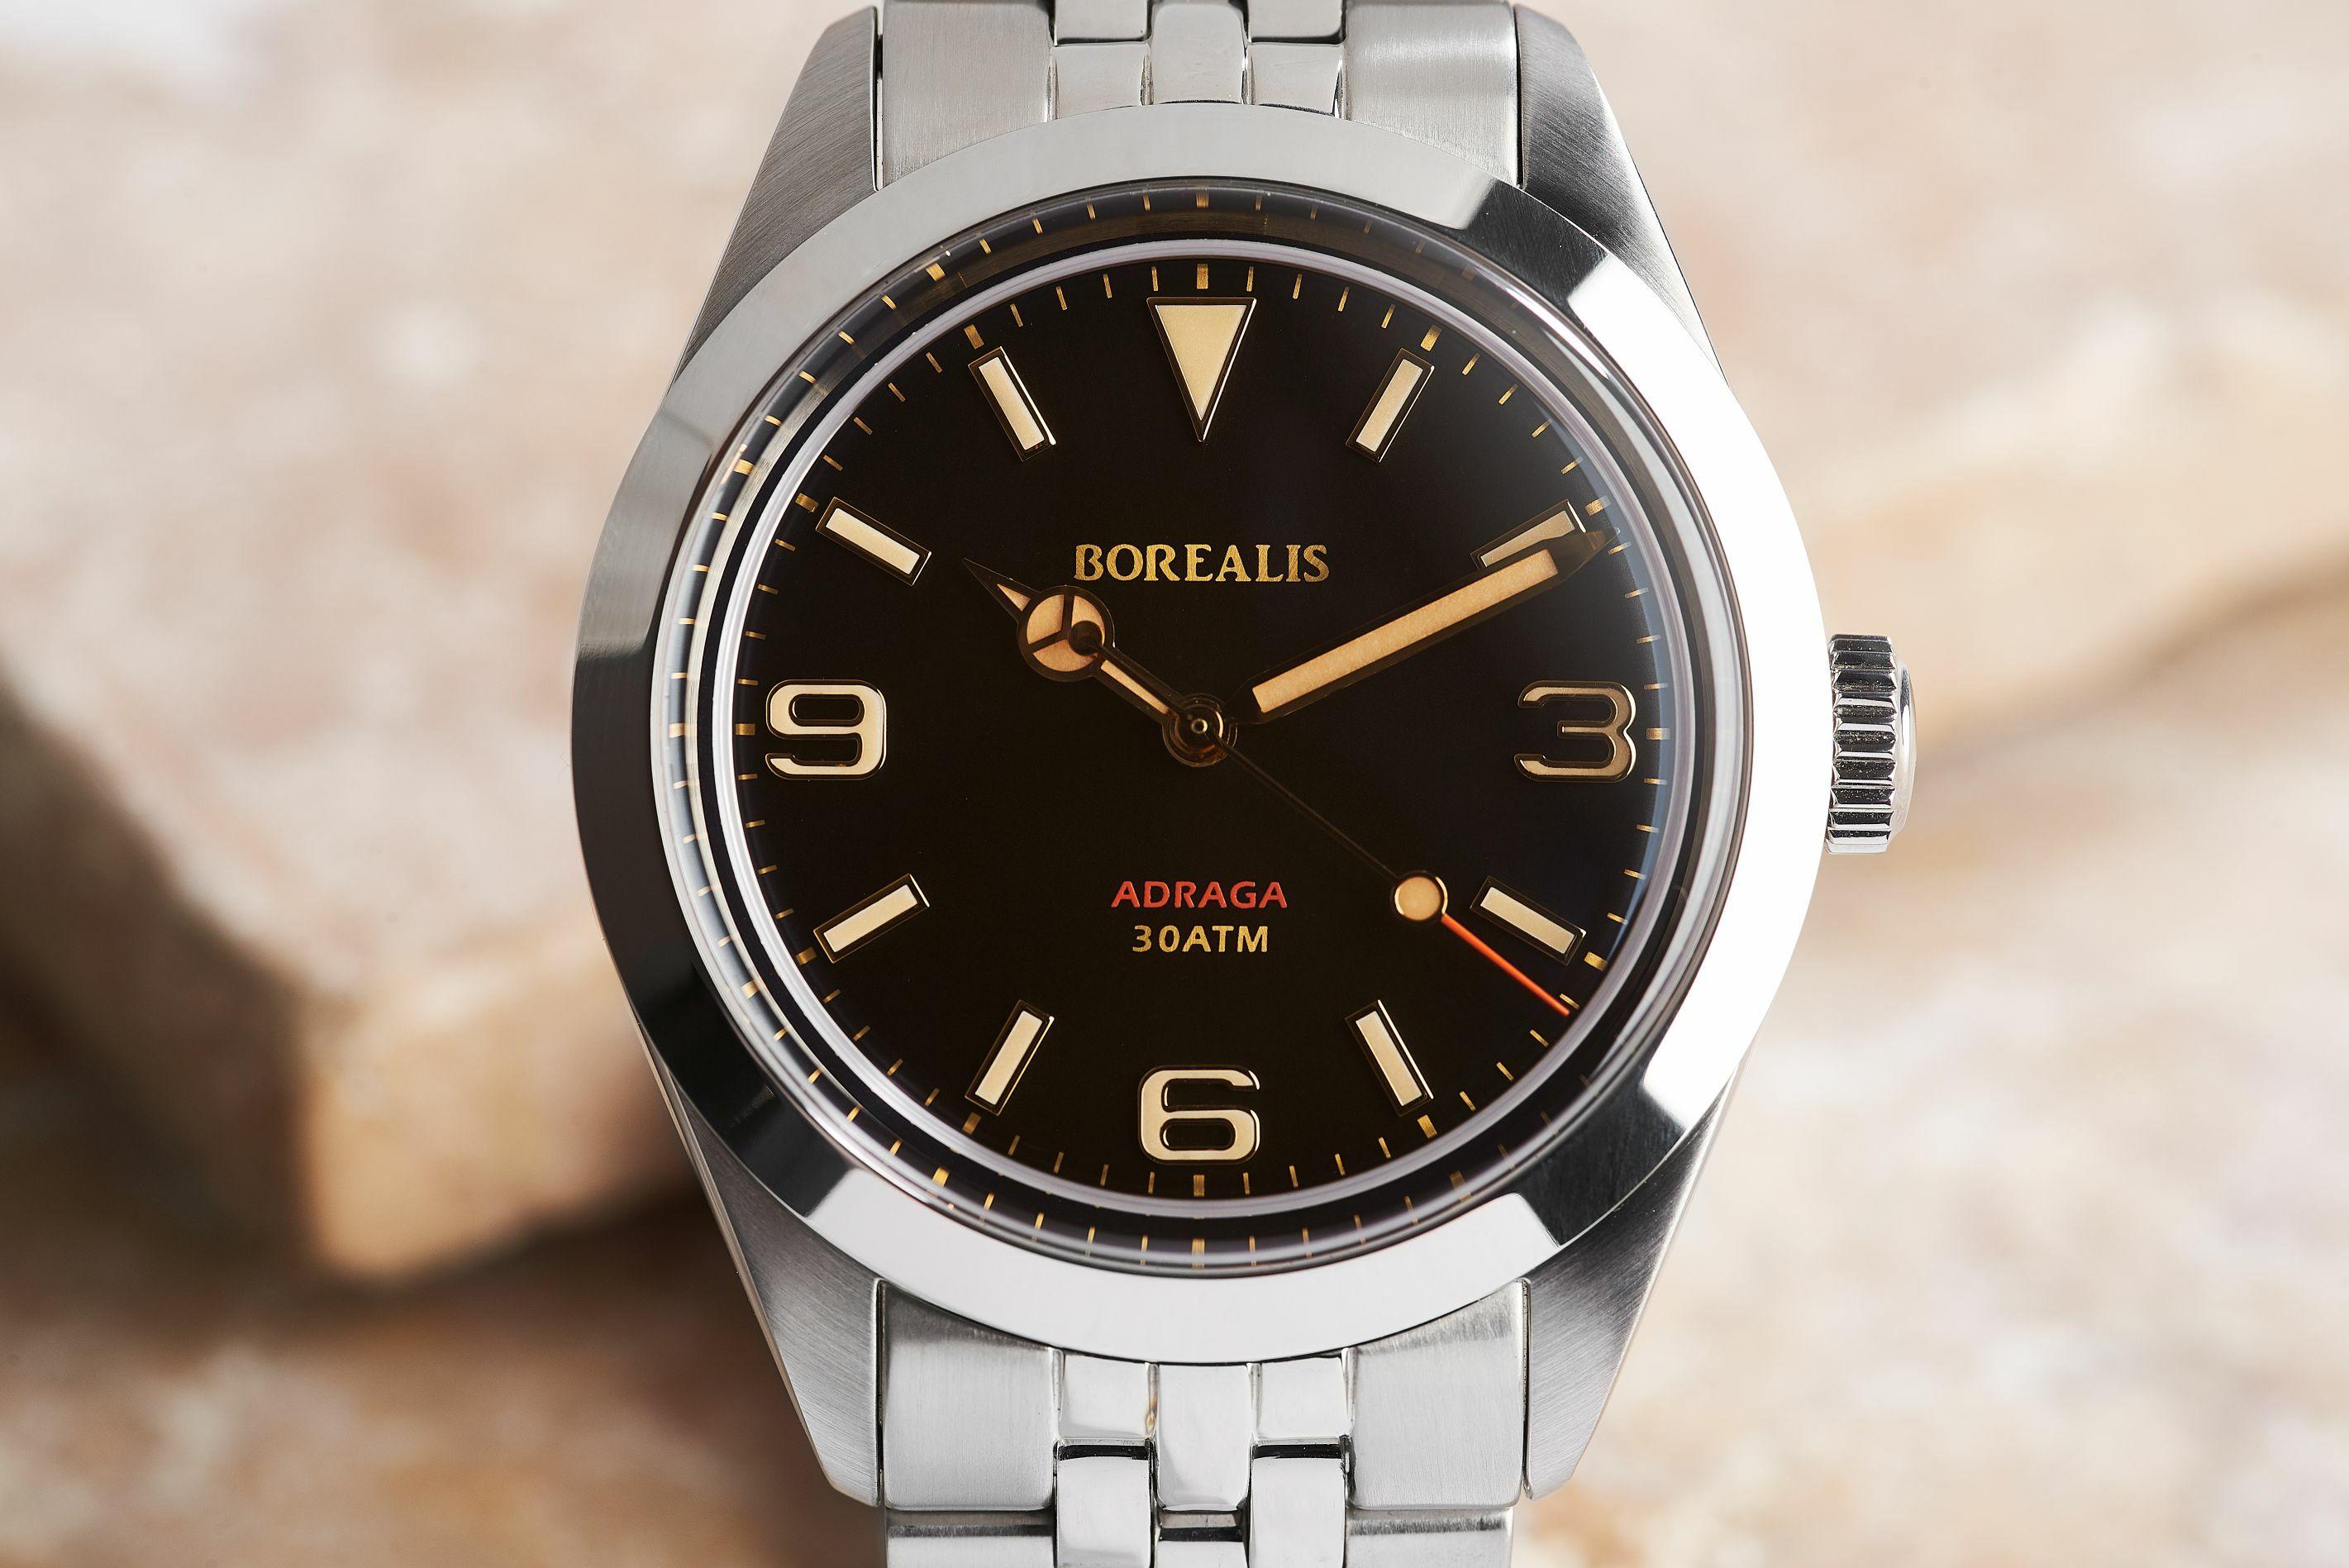 Borealis Adraga Stainless Steel Miyota 9015 black dial Mercedes Hands No Date Old Radium X1 lume ADRAGA2BB